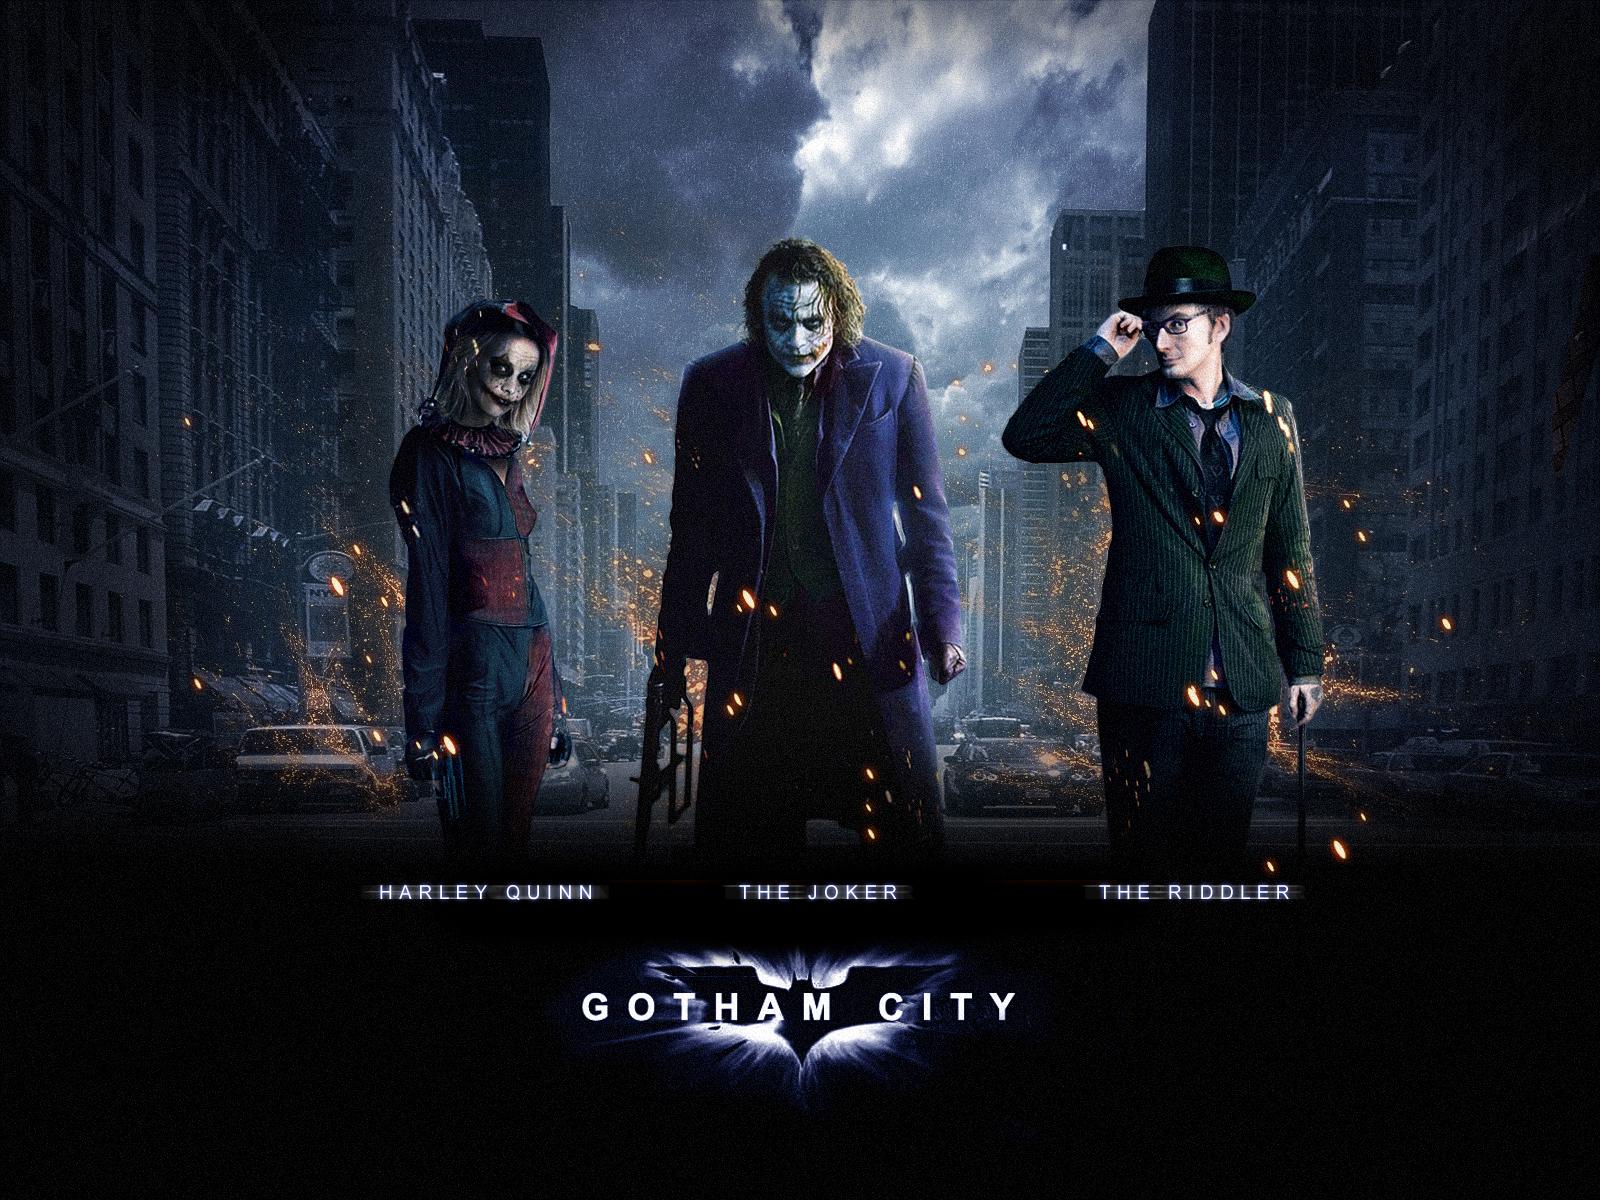 Wallpaper wallpaper movie - Gotham wallpaper ...